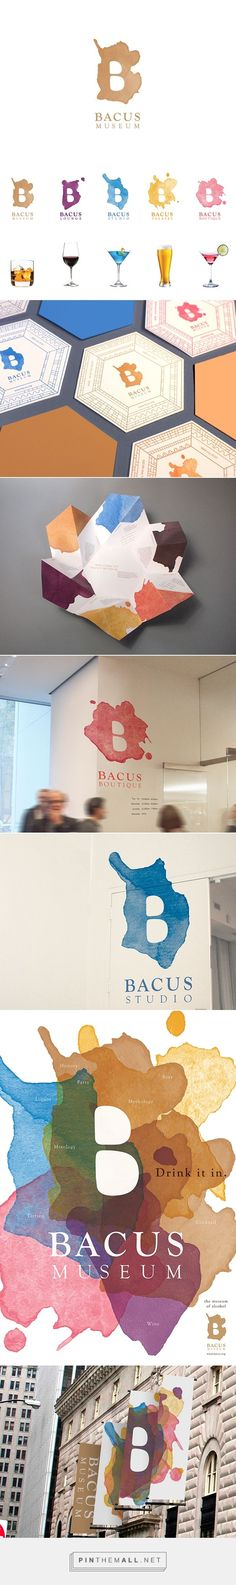 BACUS MUSEUM on Behance | Fivestar Branding – Design and Branding Agency & Inspiration Gallery